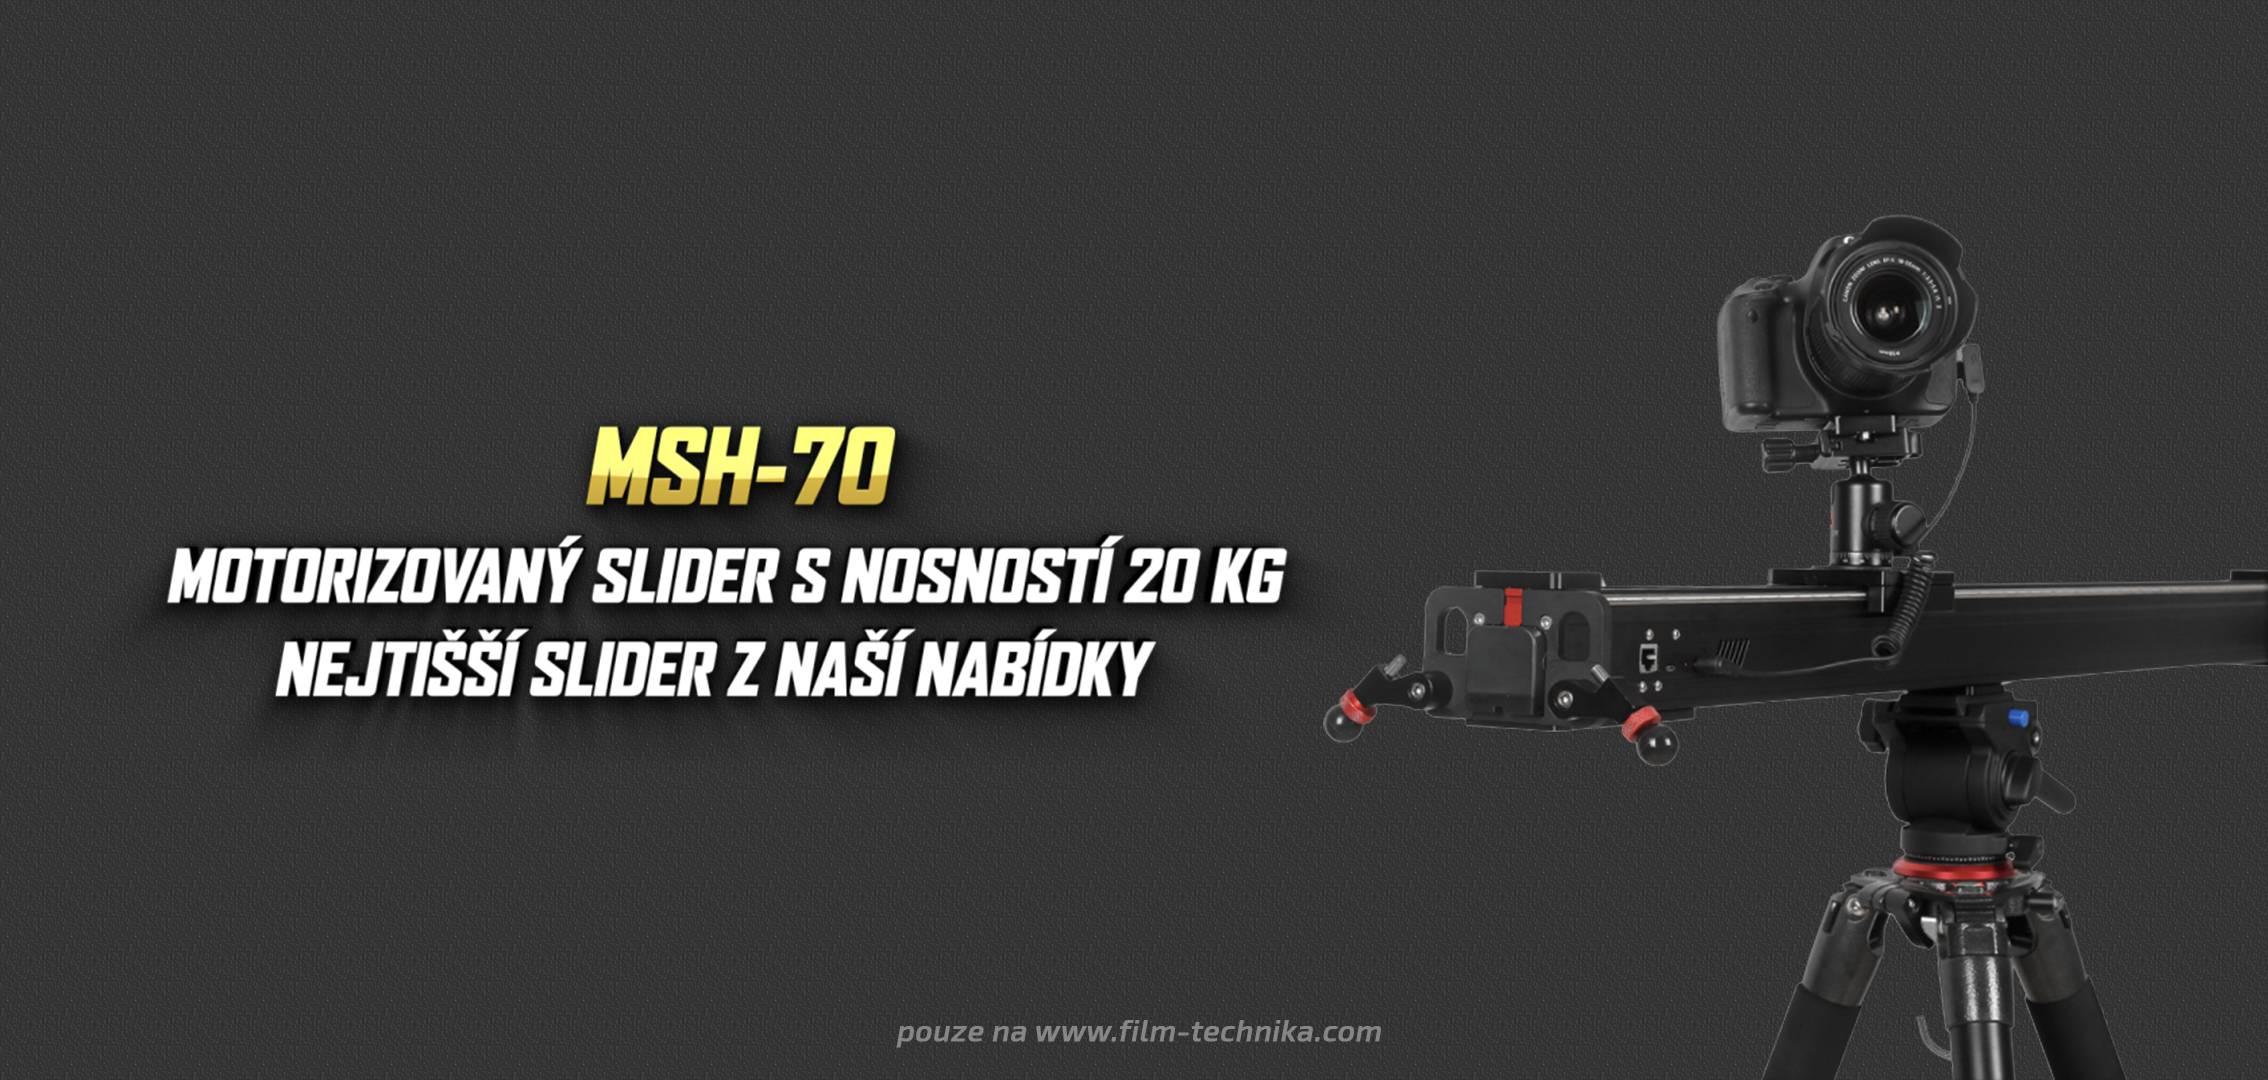 film-technika-motorizovaný-slider-msh-70-slider-s-nosnosti-20-kg-2